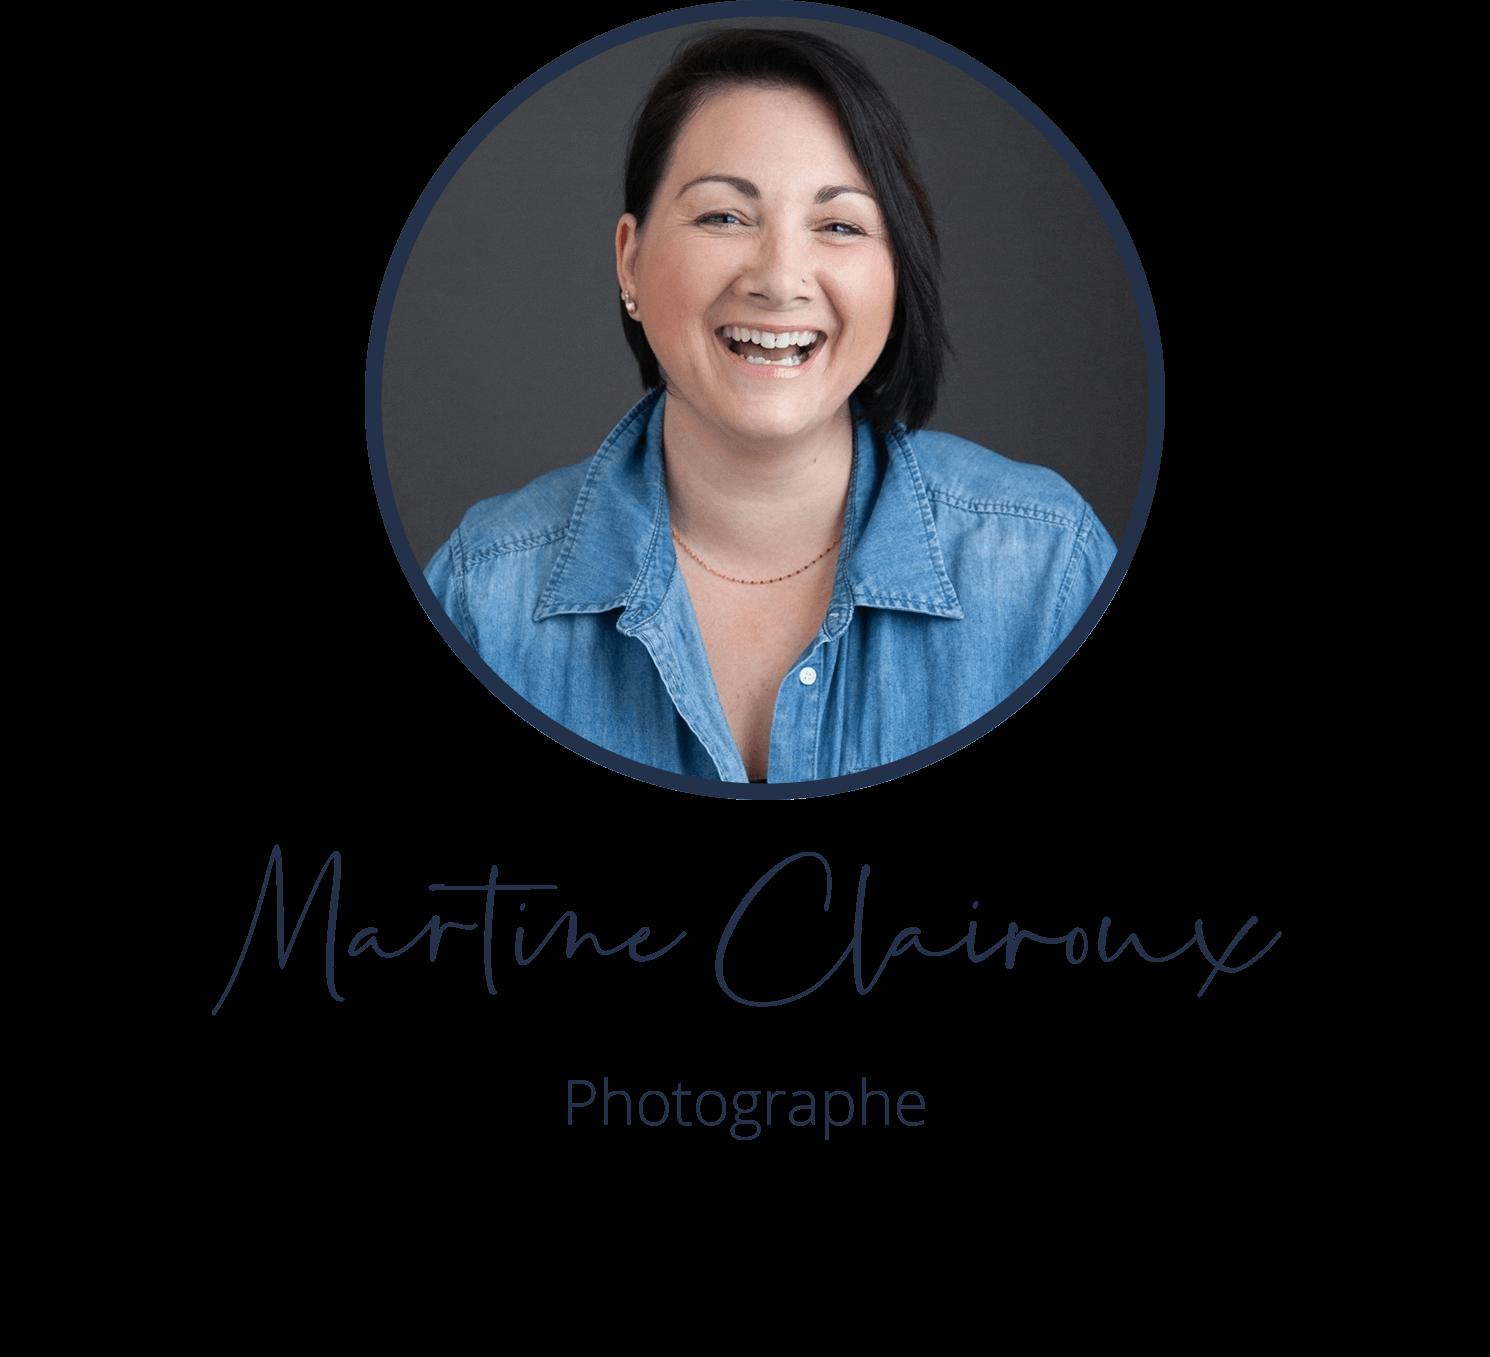 Martine Clairoux, Photographe